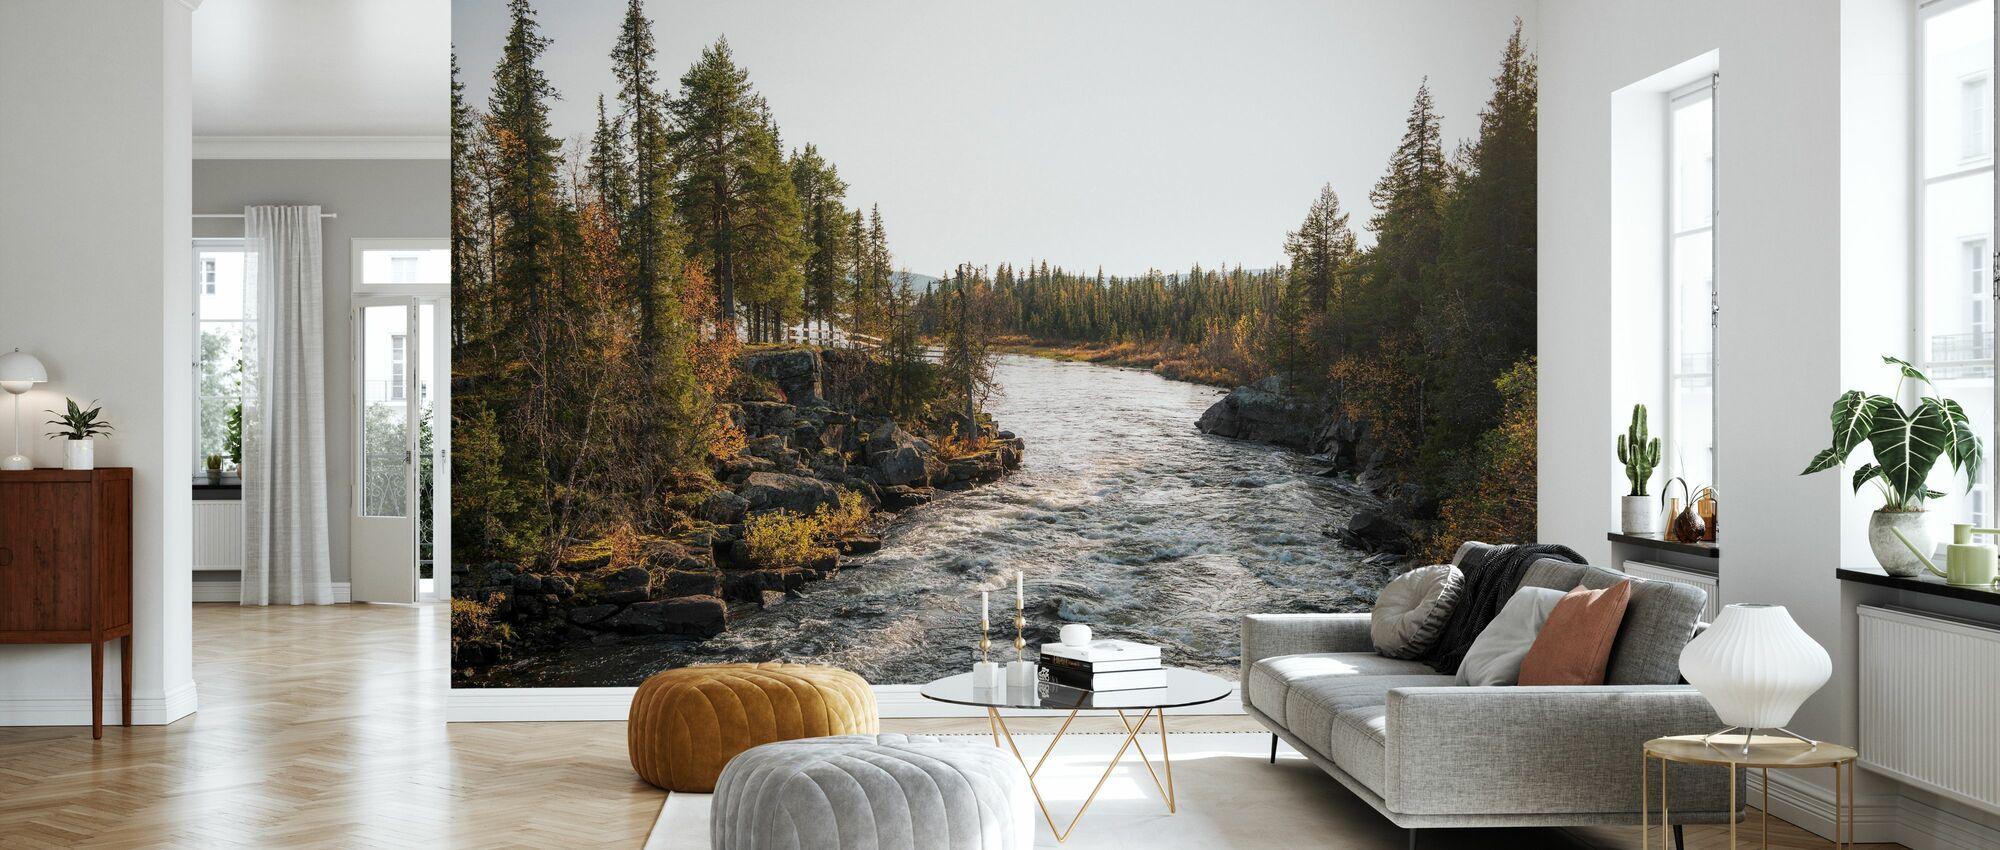 Dance of the River - Wallpaper - Living Room